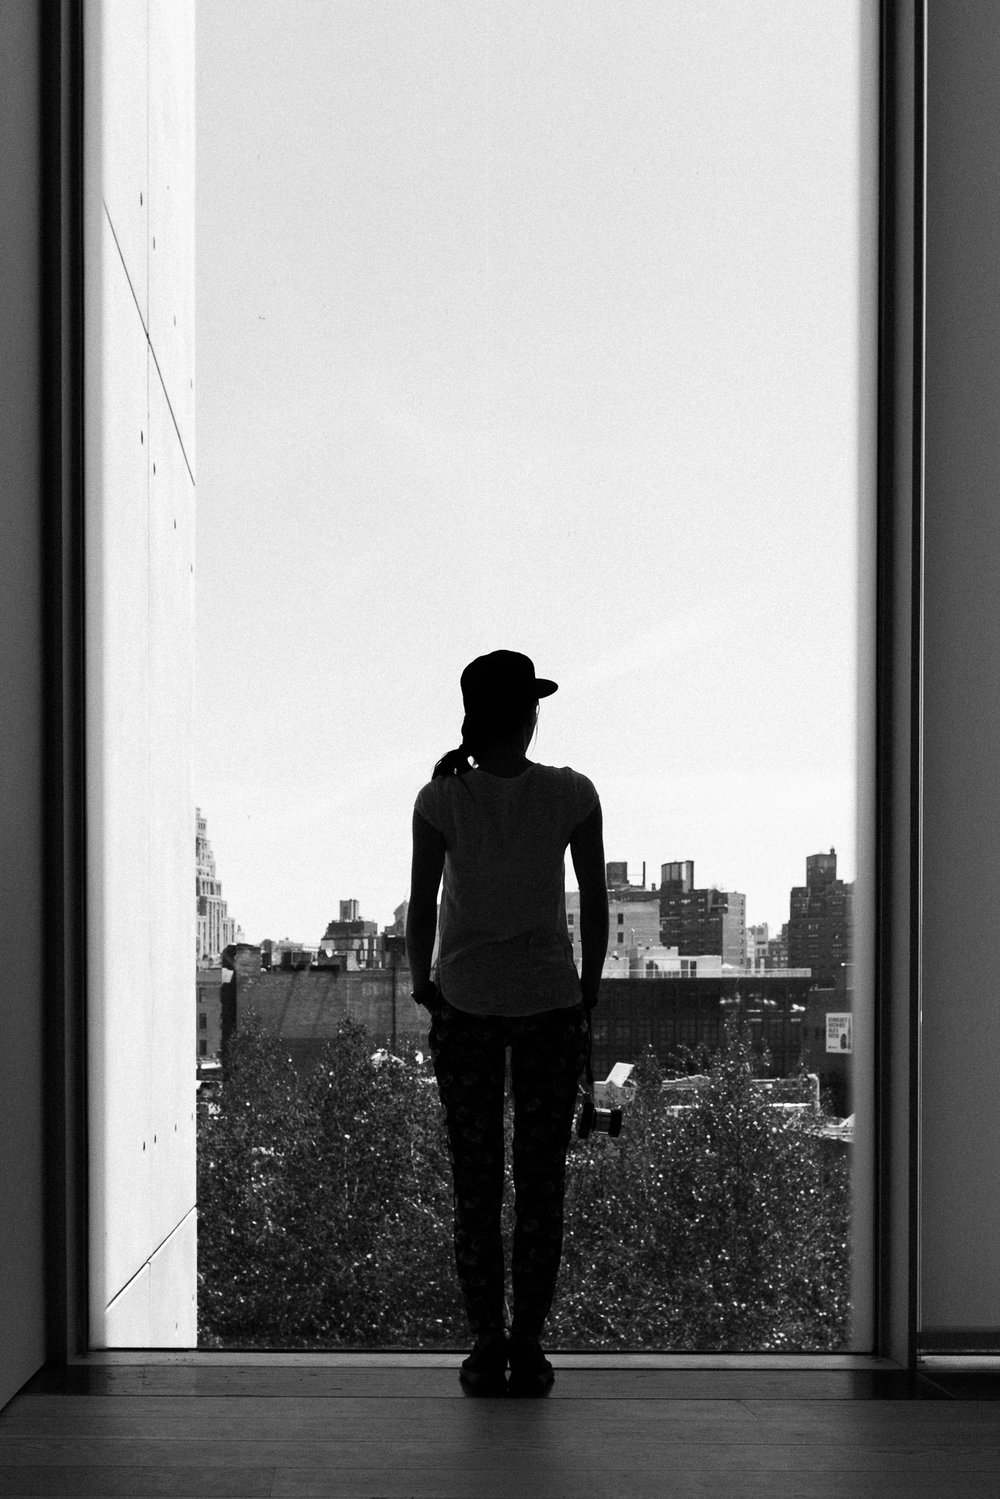 2015-05-14-NYC-4596.jpg